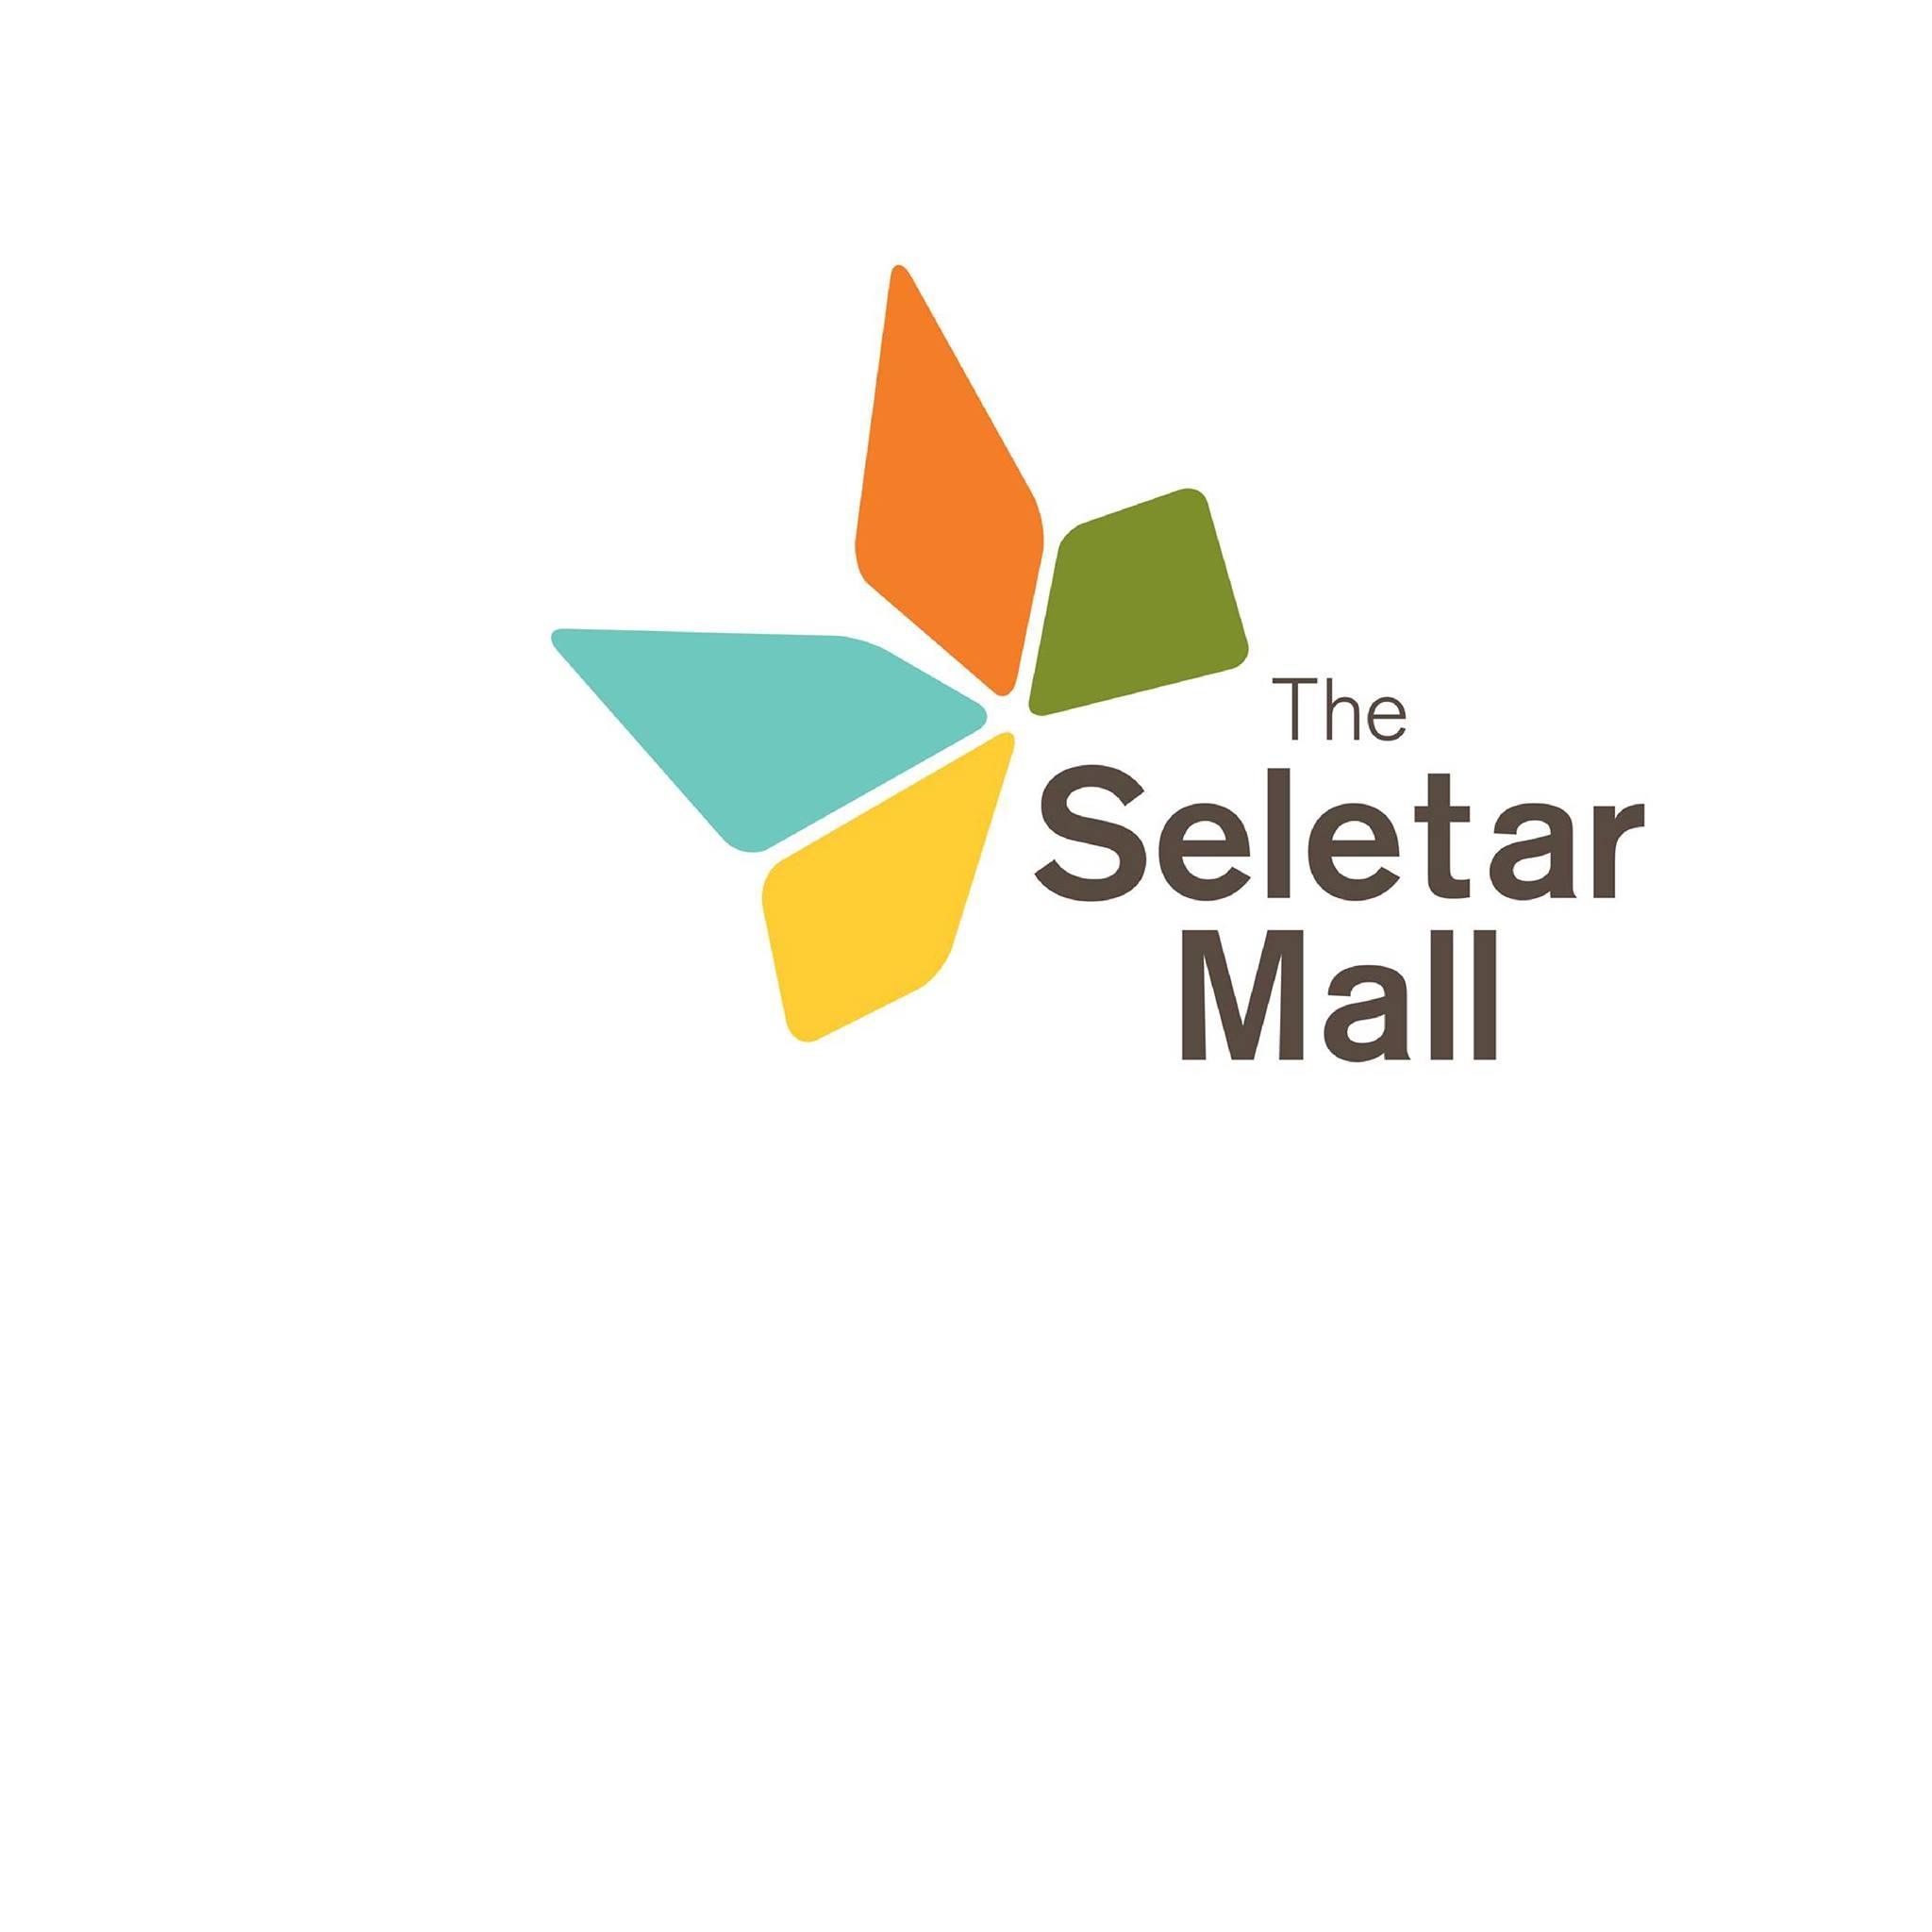 the seletar mall logo